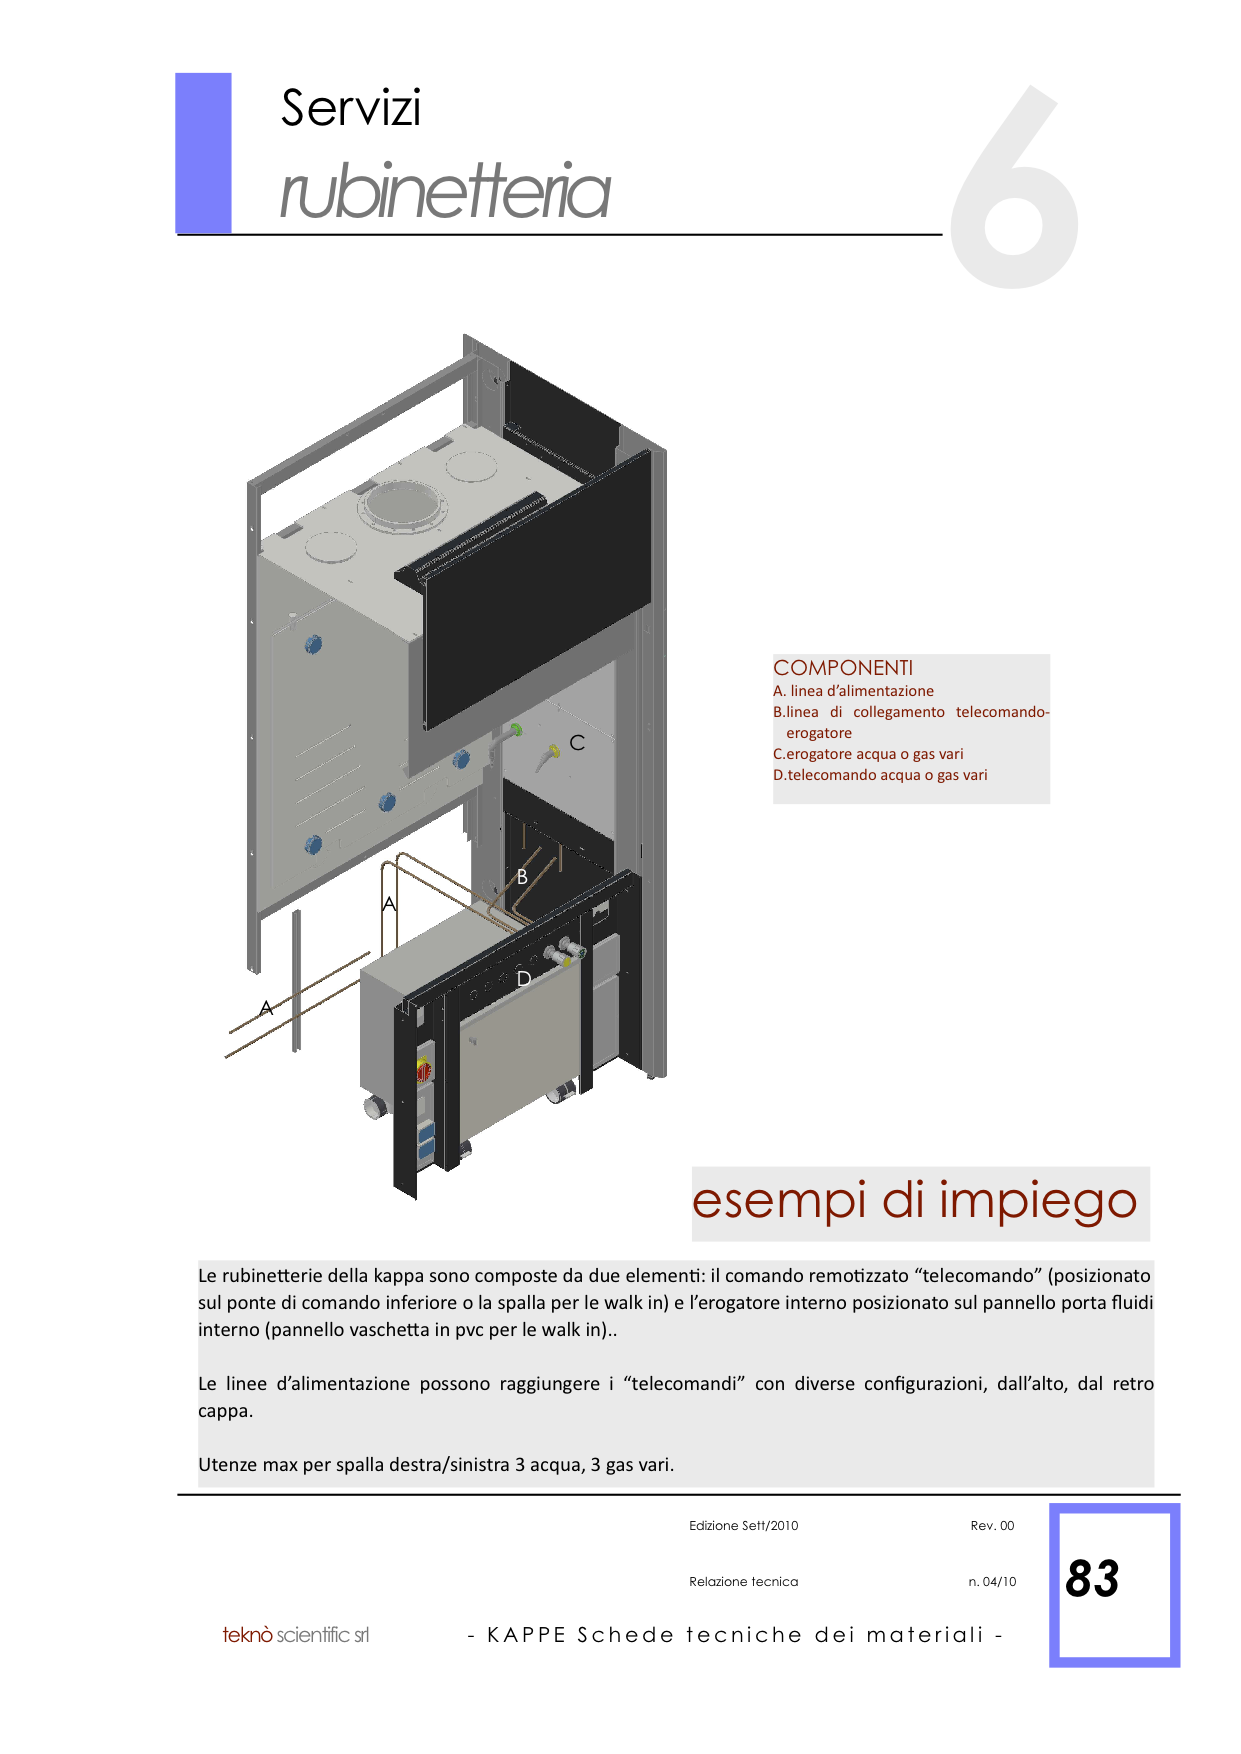 KAPPE Schede tecniche materiali copia 33.png